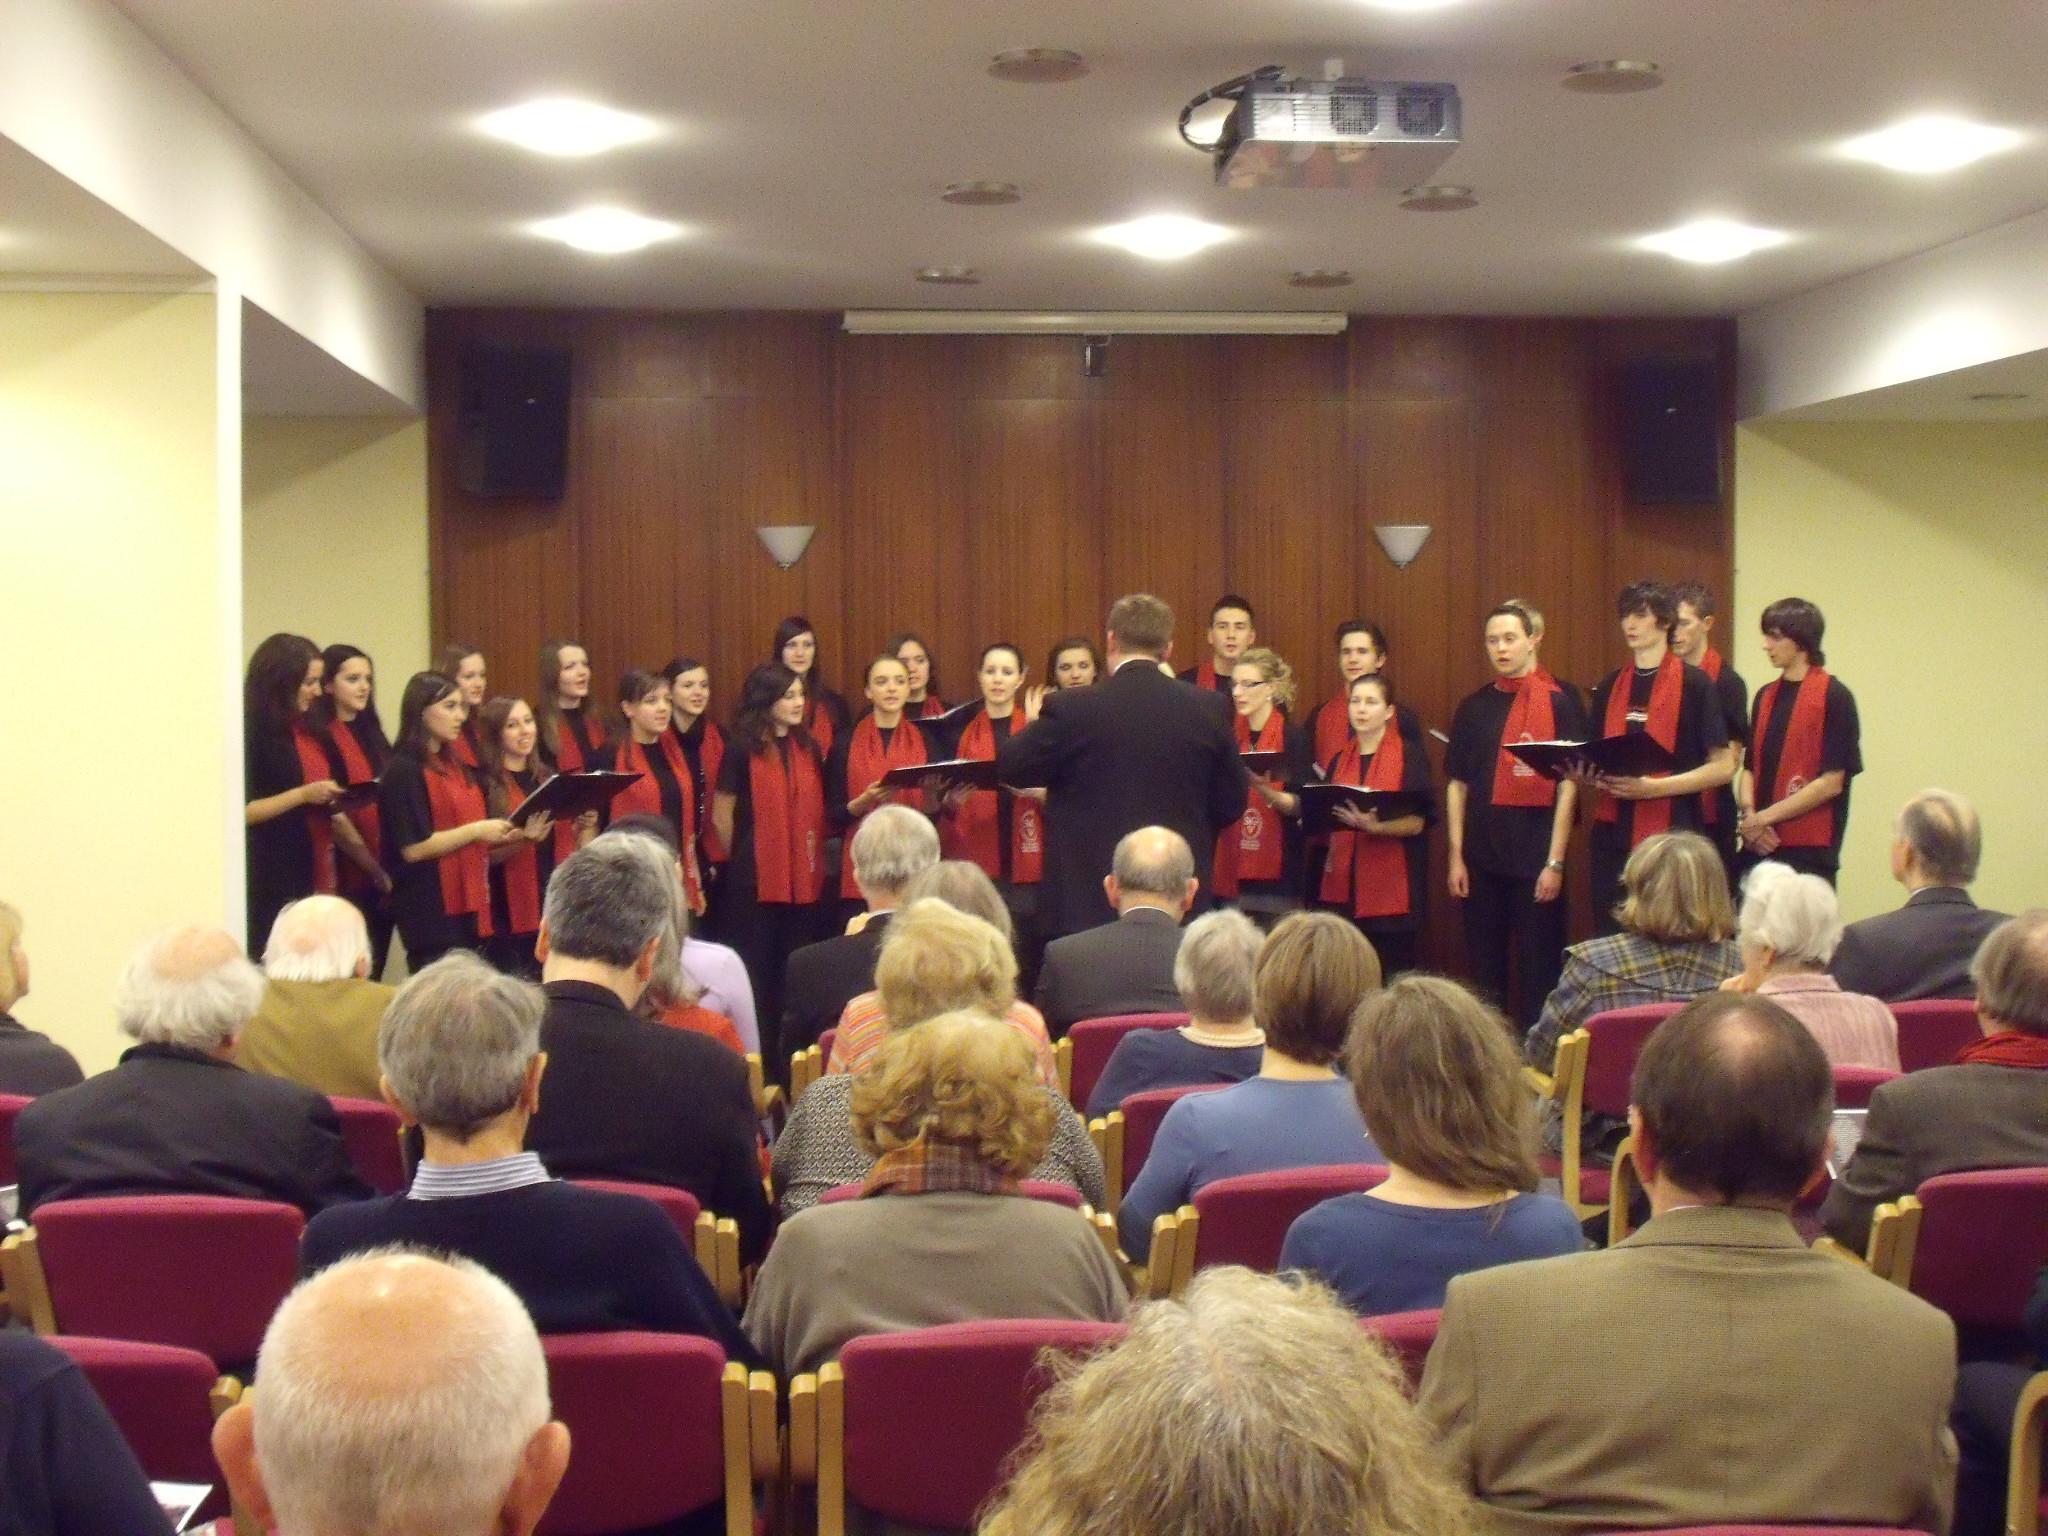 koncert-na-zu-25-3-2011.jpg